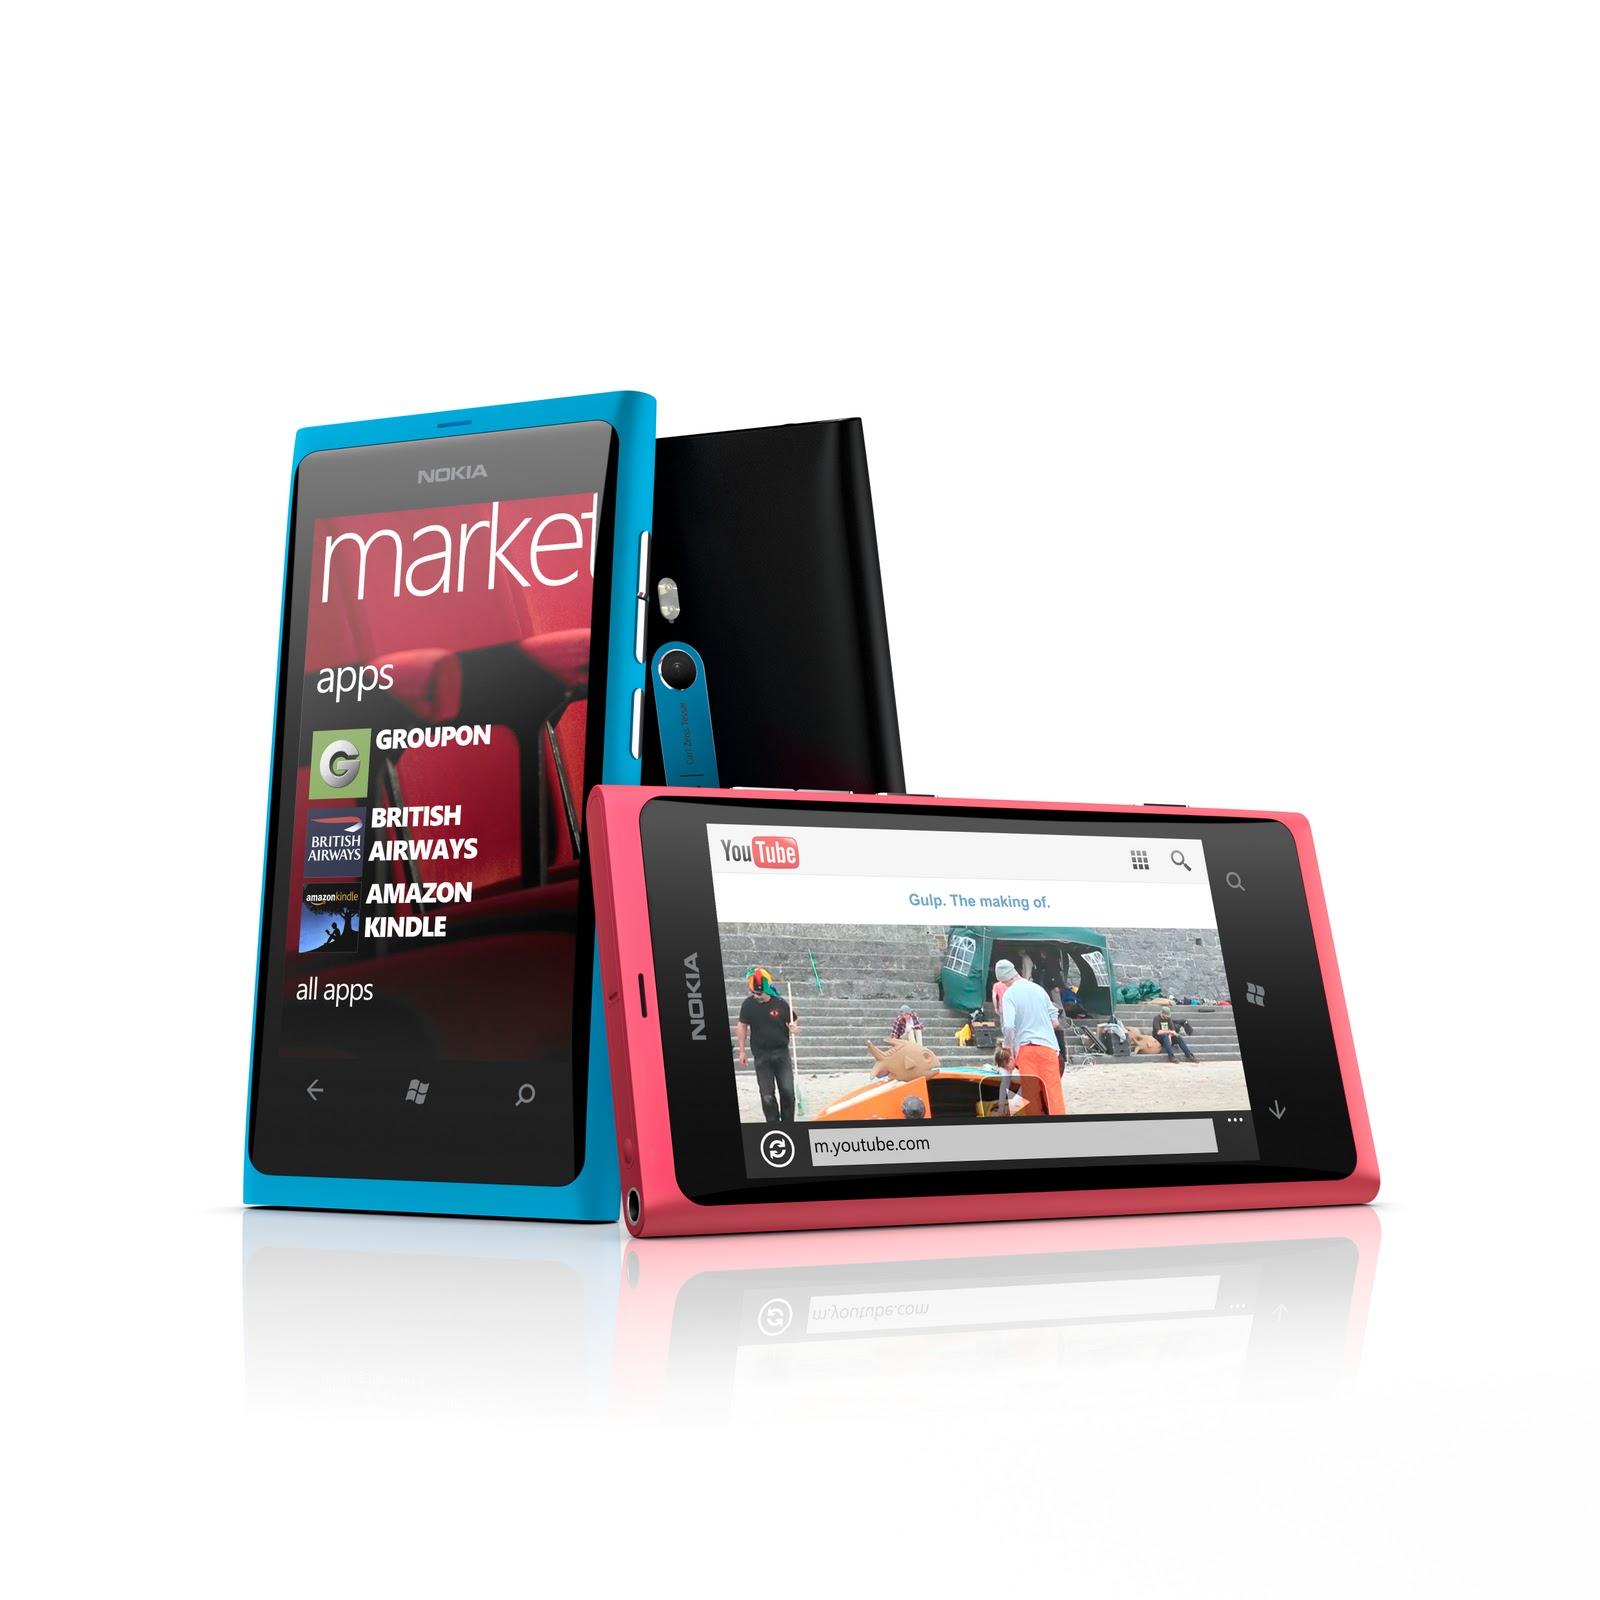 Nokia Lumia 800 Windows Phone